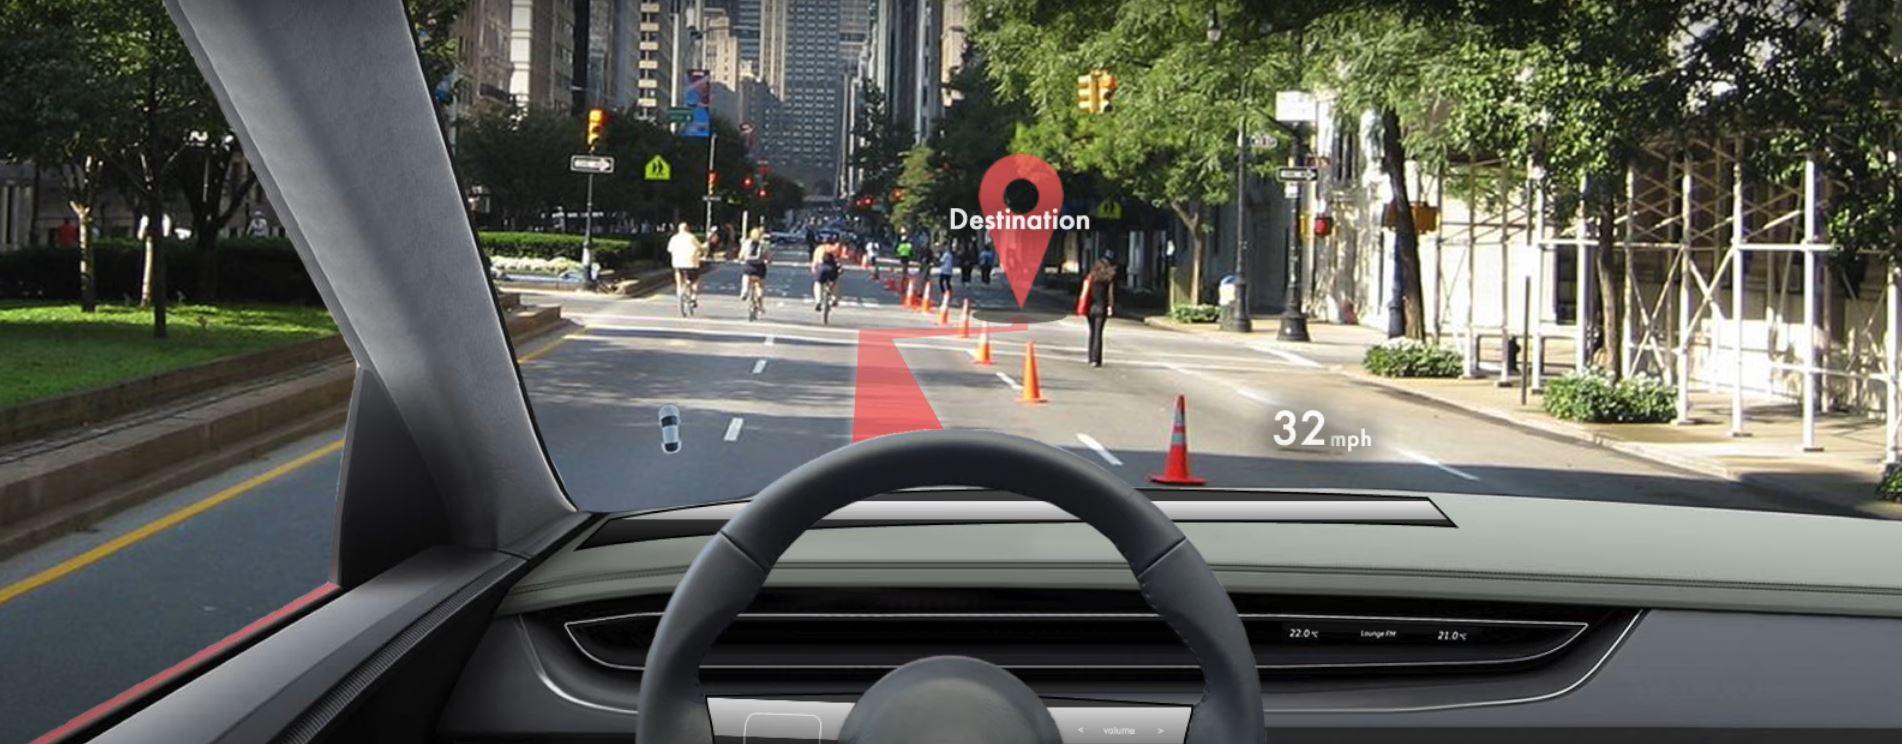 windshield hud - Heads Up Display (HUD): Drive Undistracted